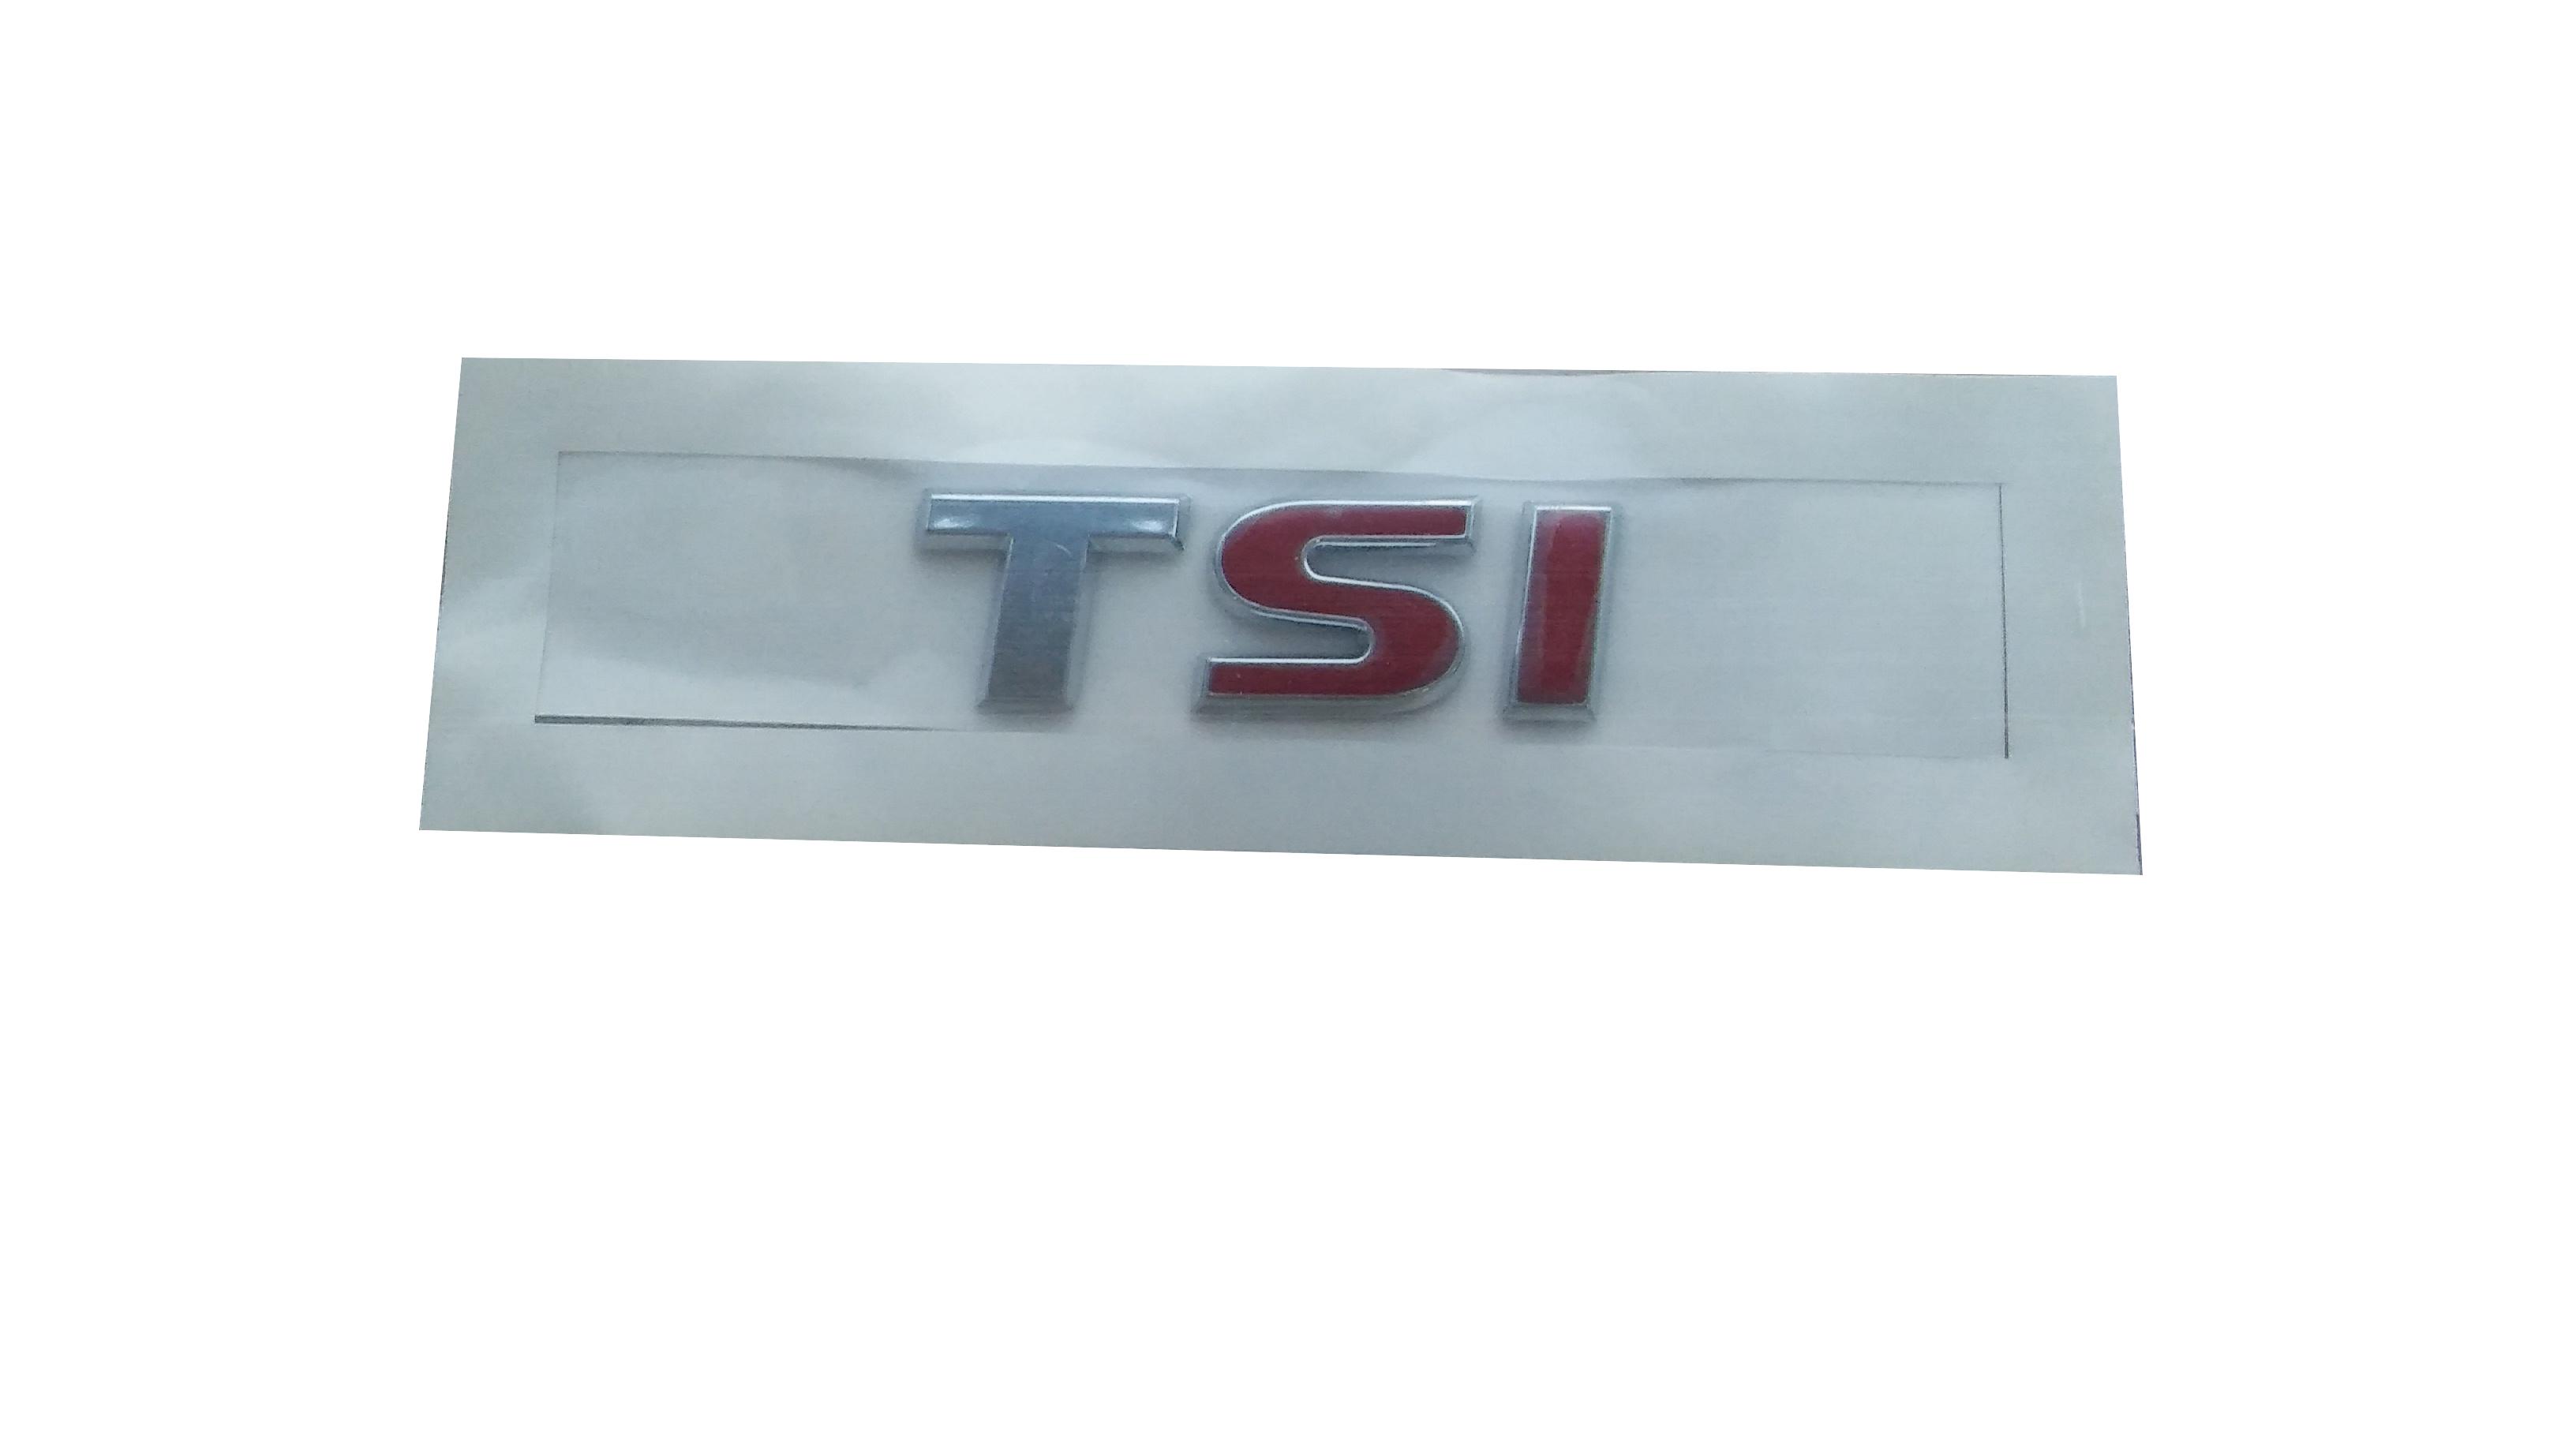 TSI Yazı Çift Kırmızı - Jetta 2010>>Üzeri